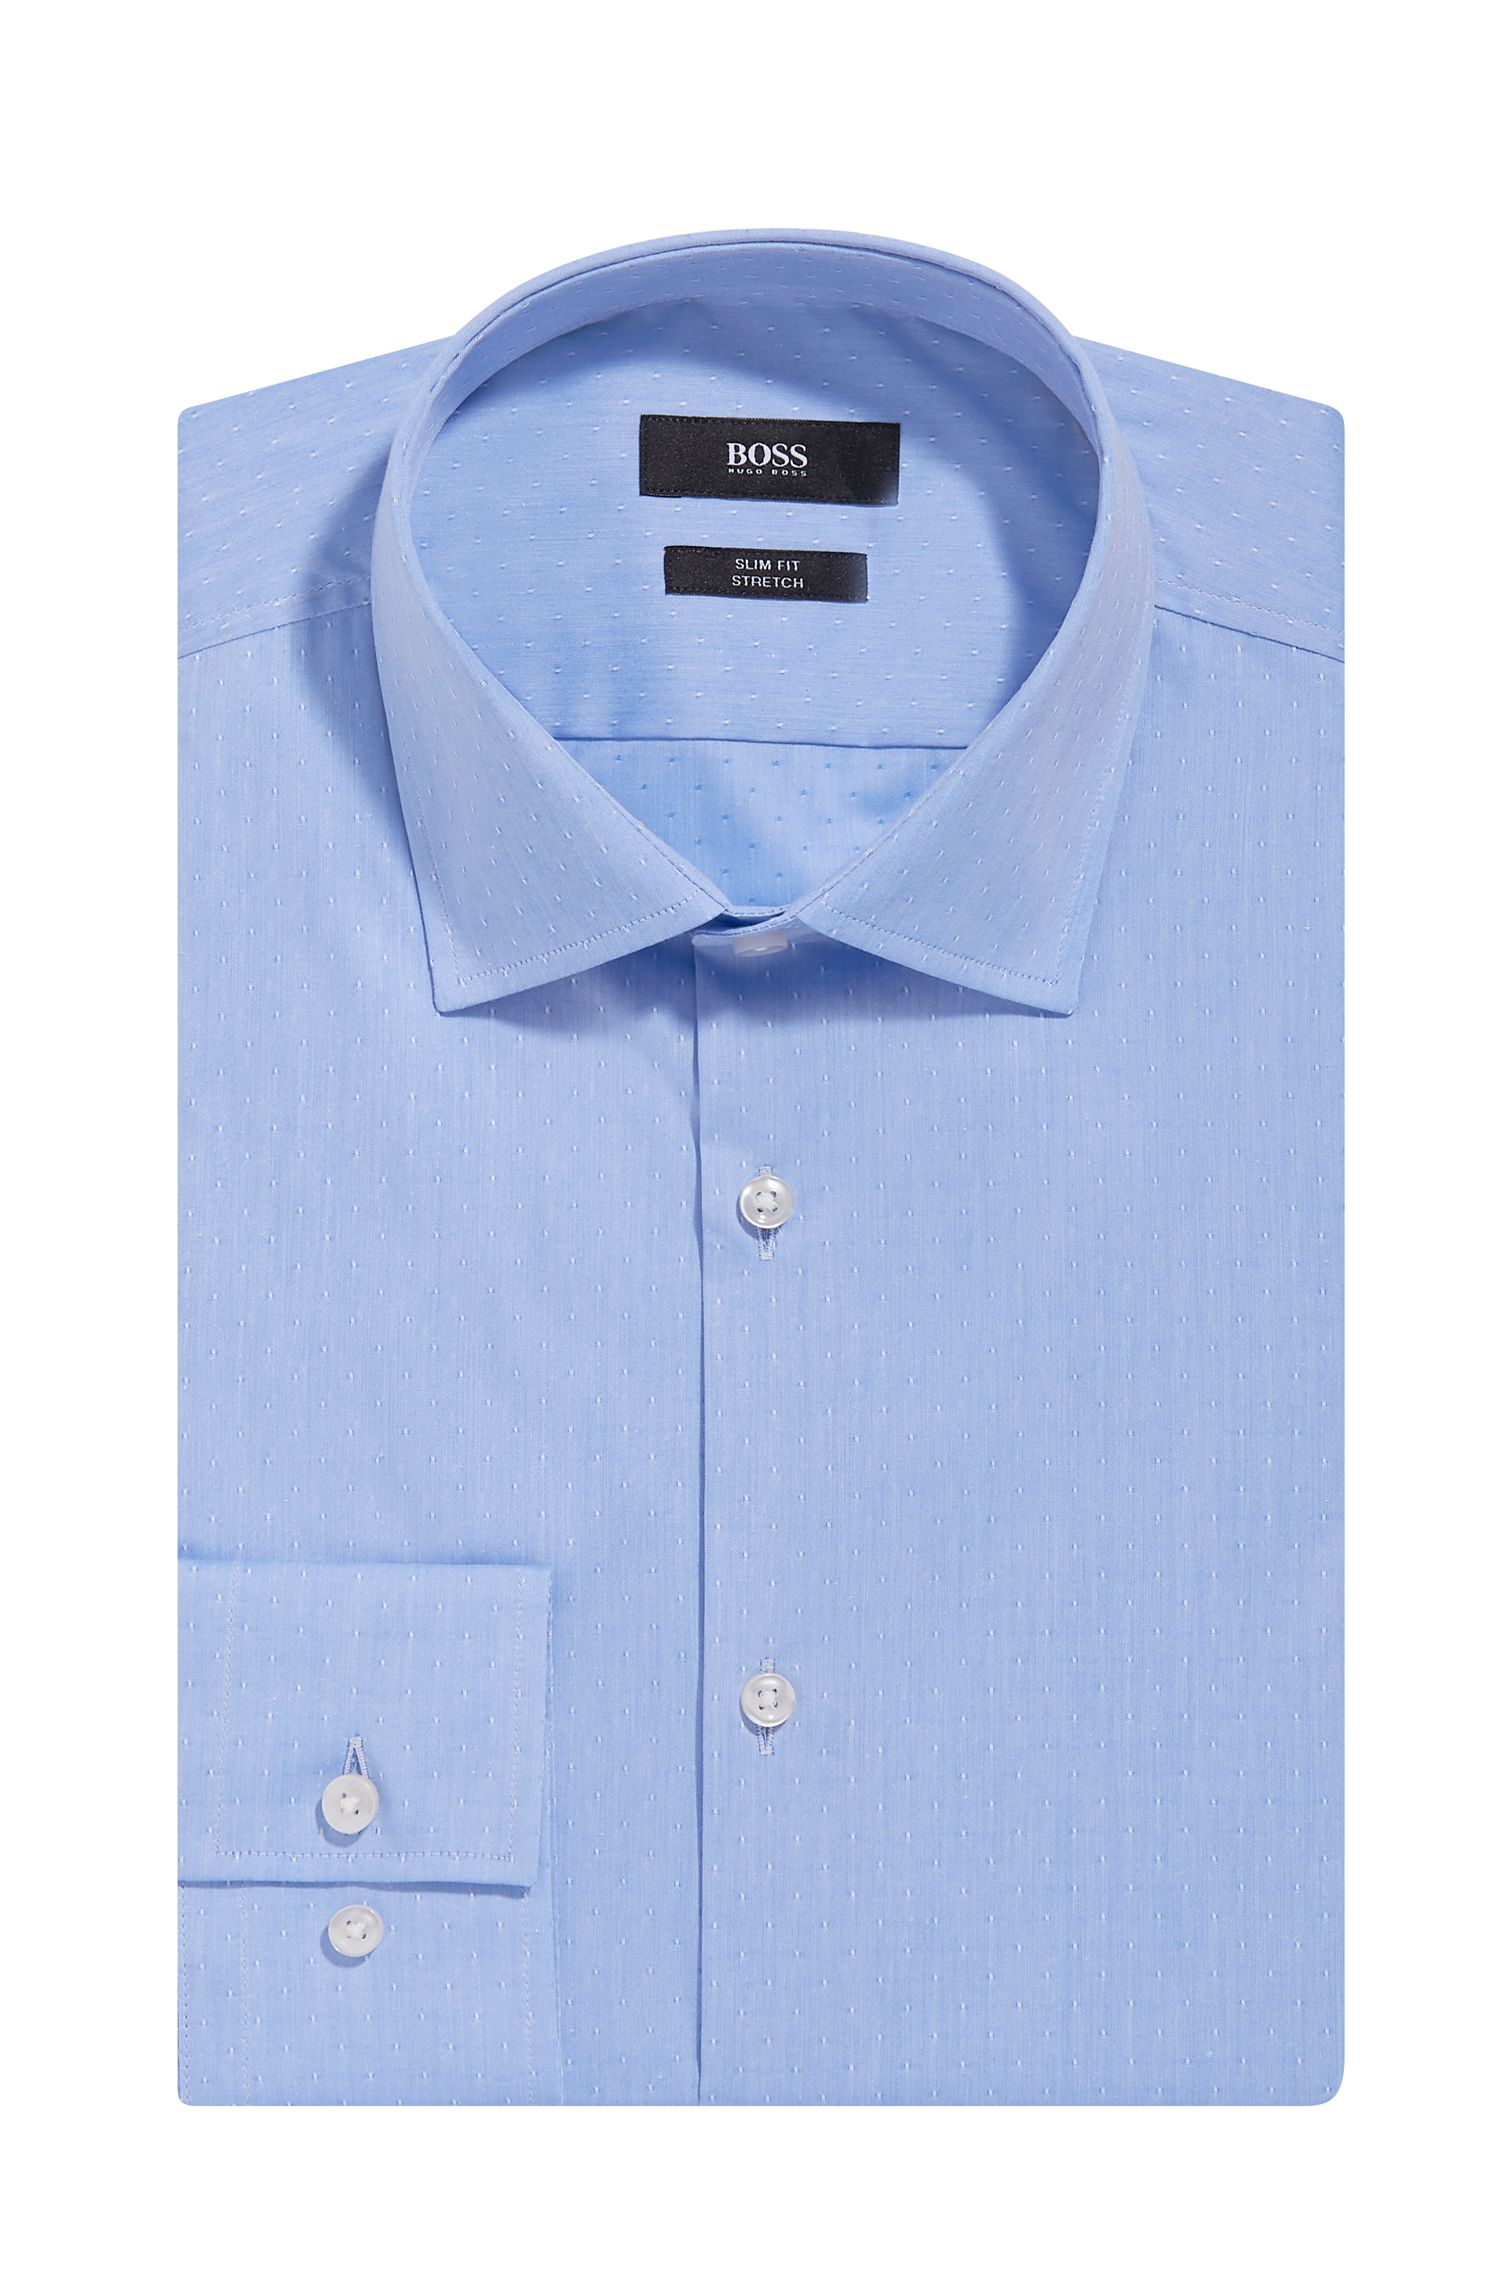 Embroidered Italian Stretch Cotton Dress Shirt, Slim Fit | Jenno